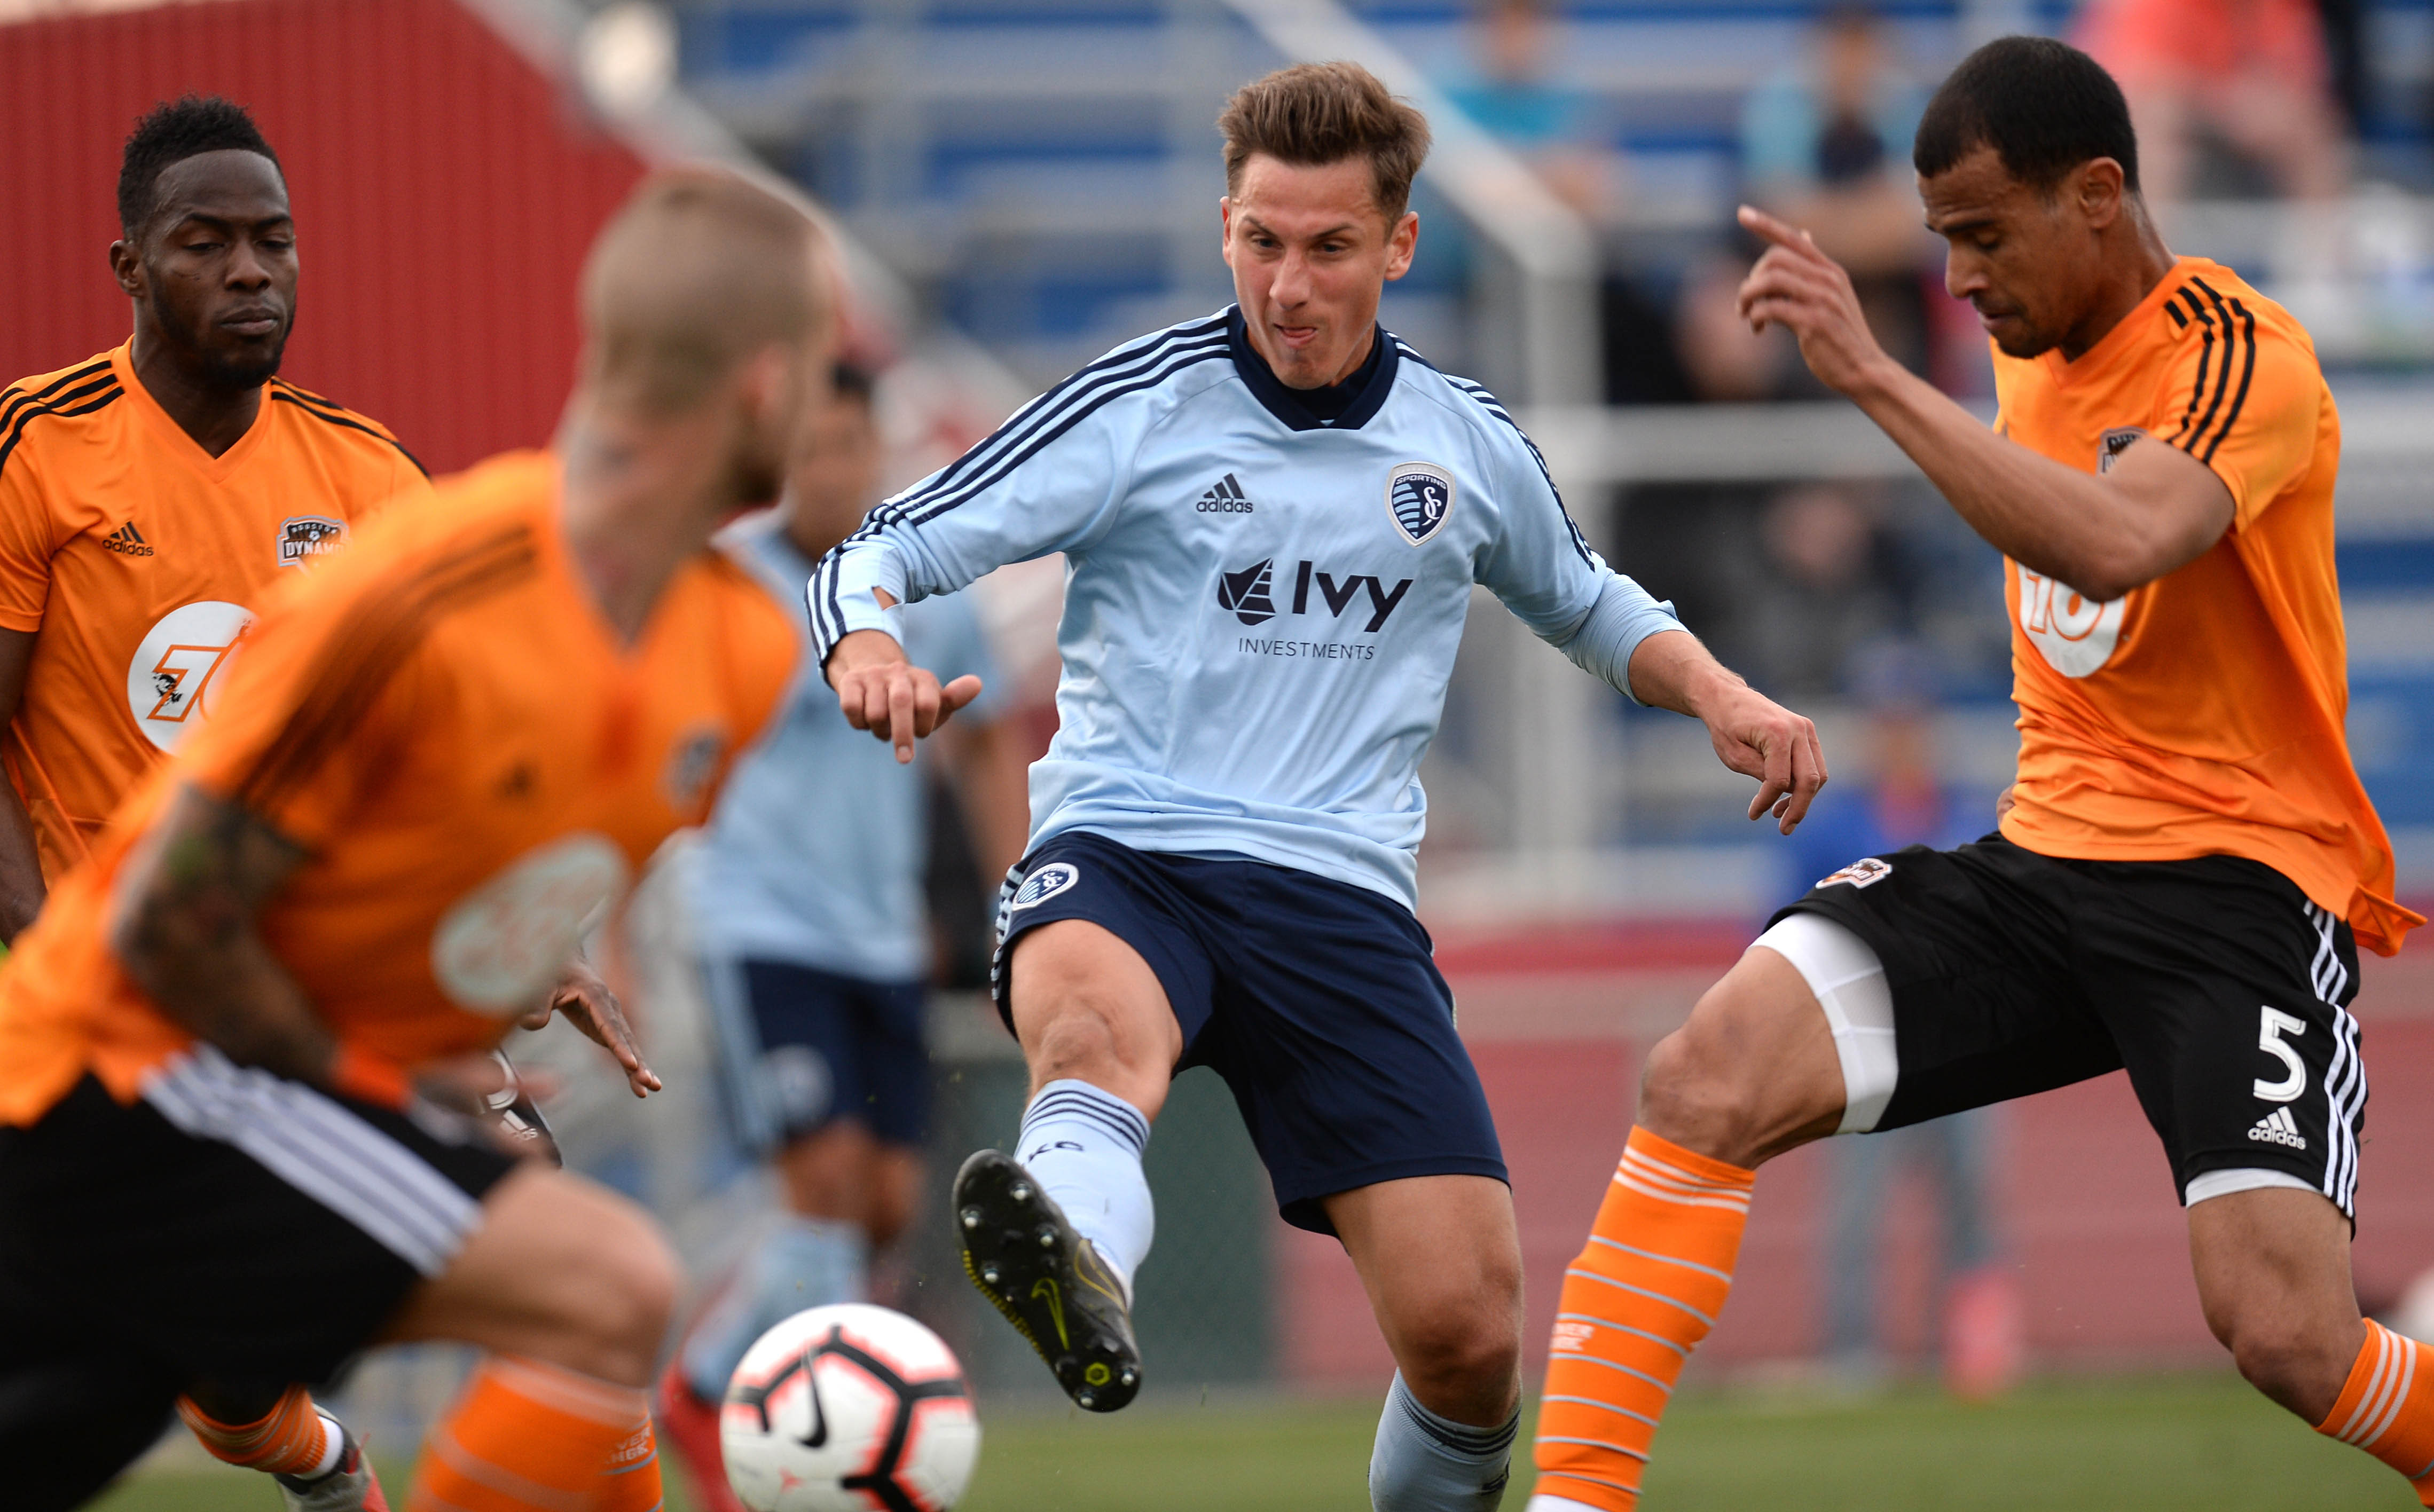 MLS: Mobile Mini Sun Cup-Sporting KC at Houston Dynamo